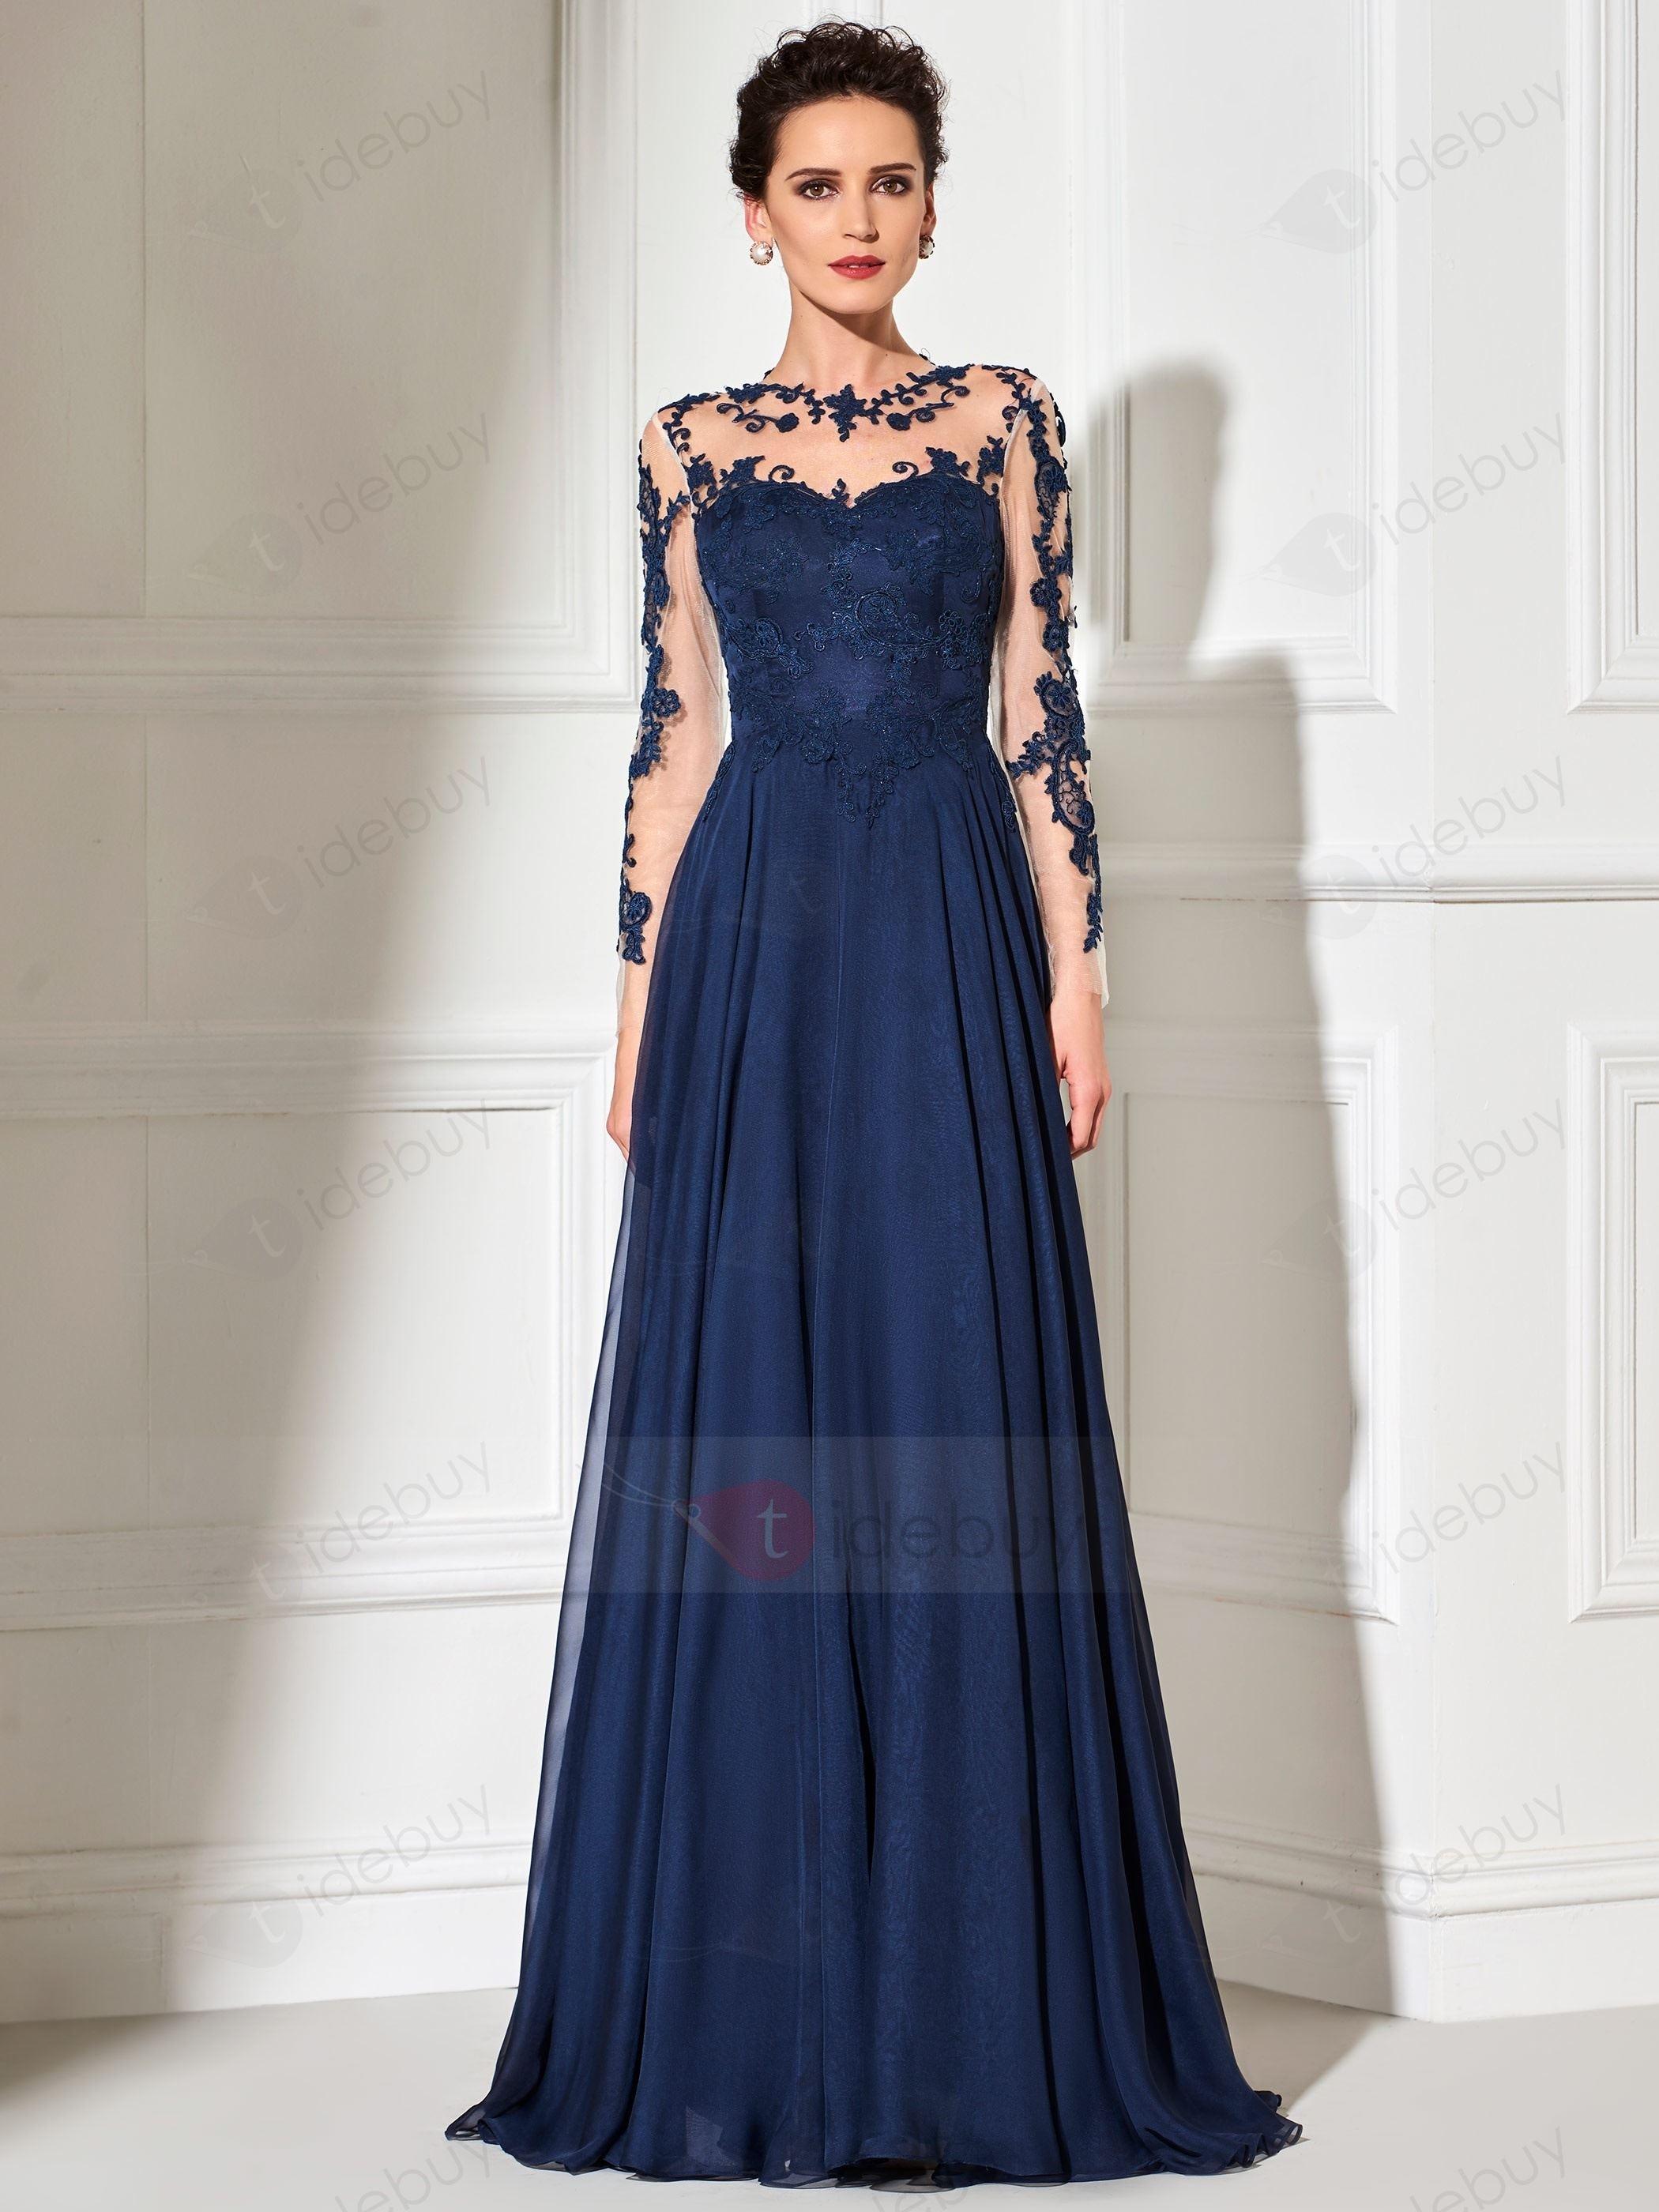 15 Schön Abendkleid Seide Lang Galerie17 Top Abendkleid Seide Lang für 2019